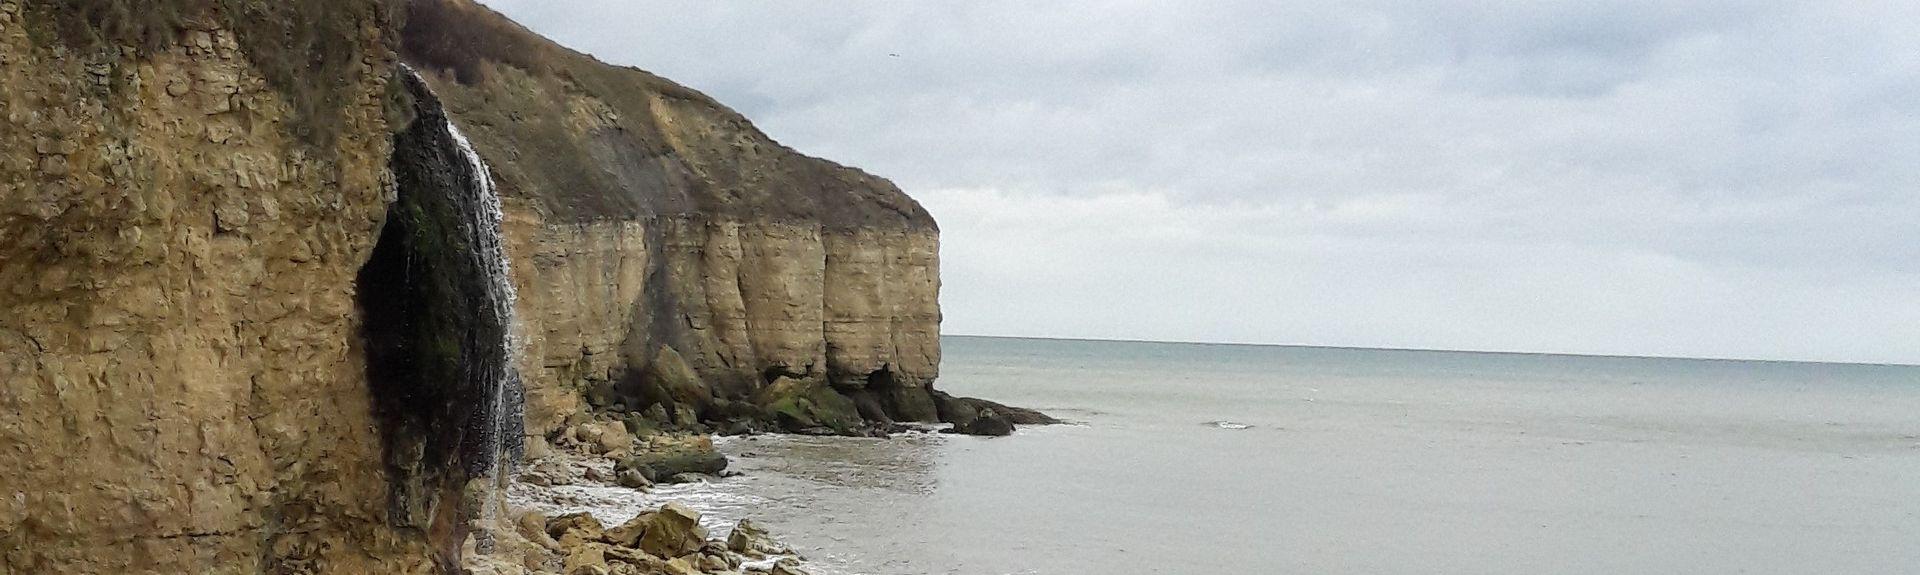 Juaye-Mondaye, Normandiet, Frankrig